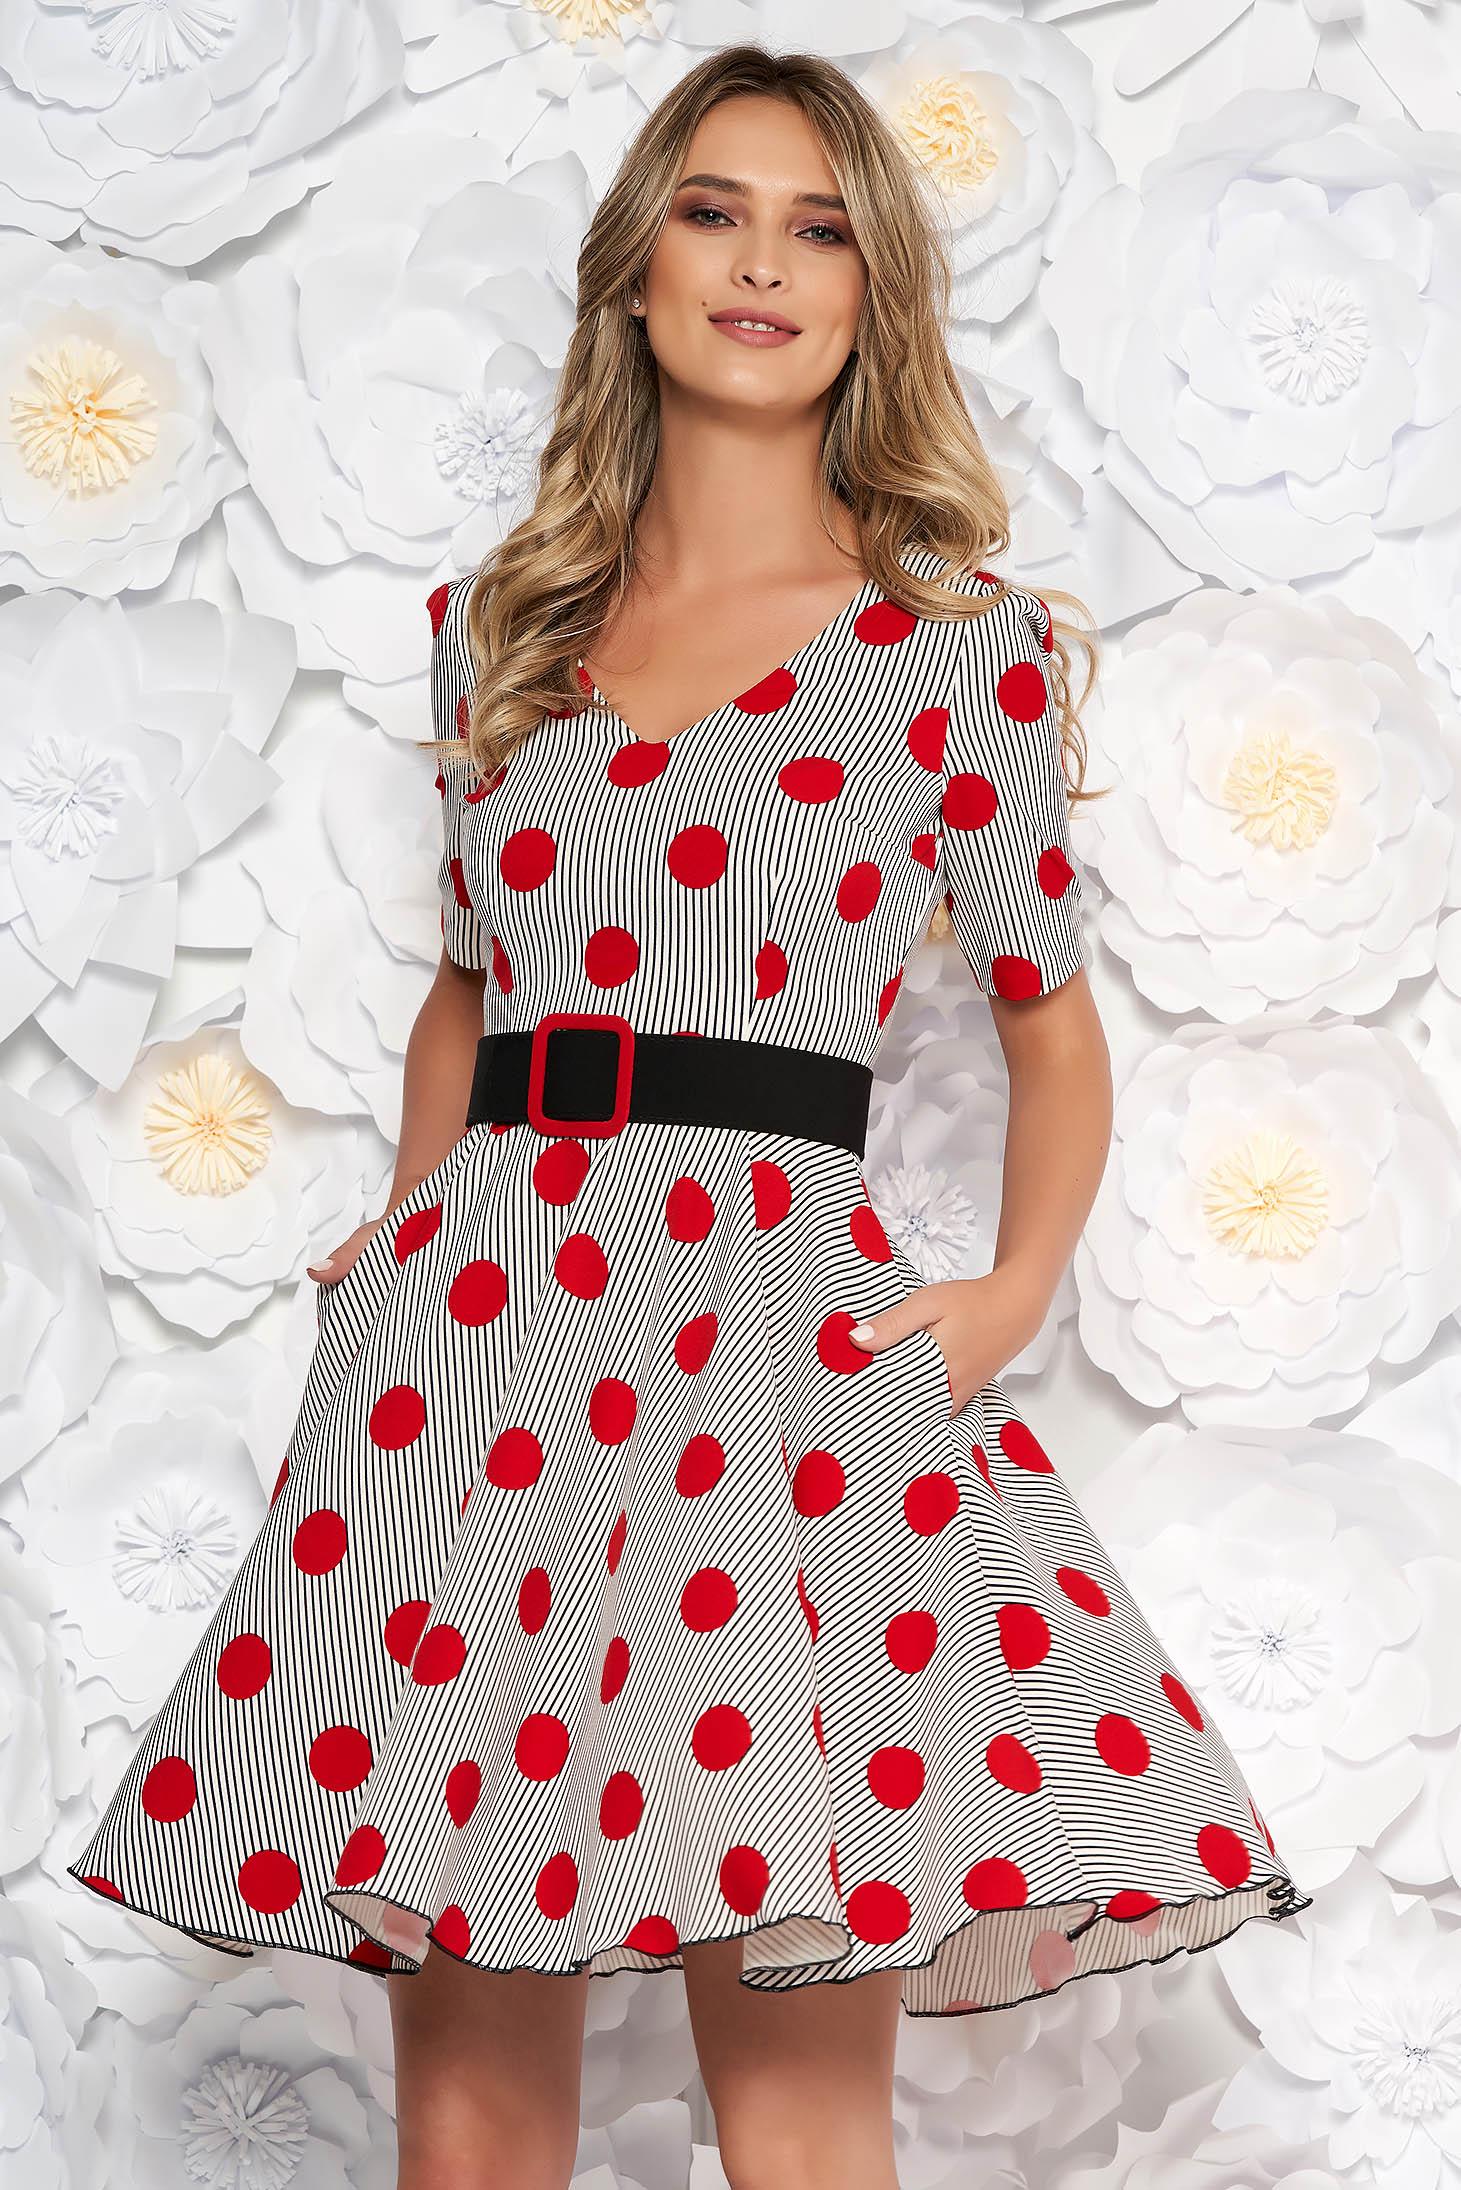 Fofy red dress